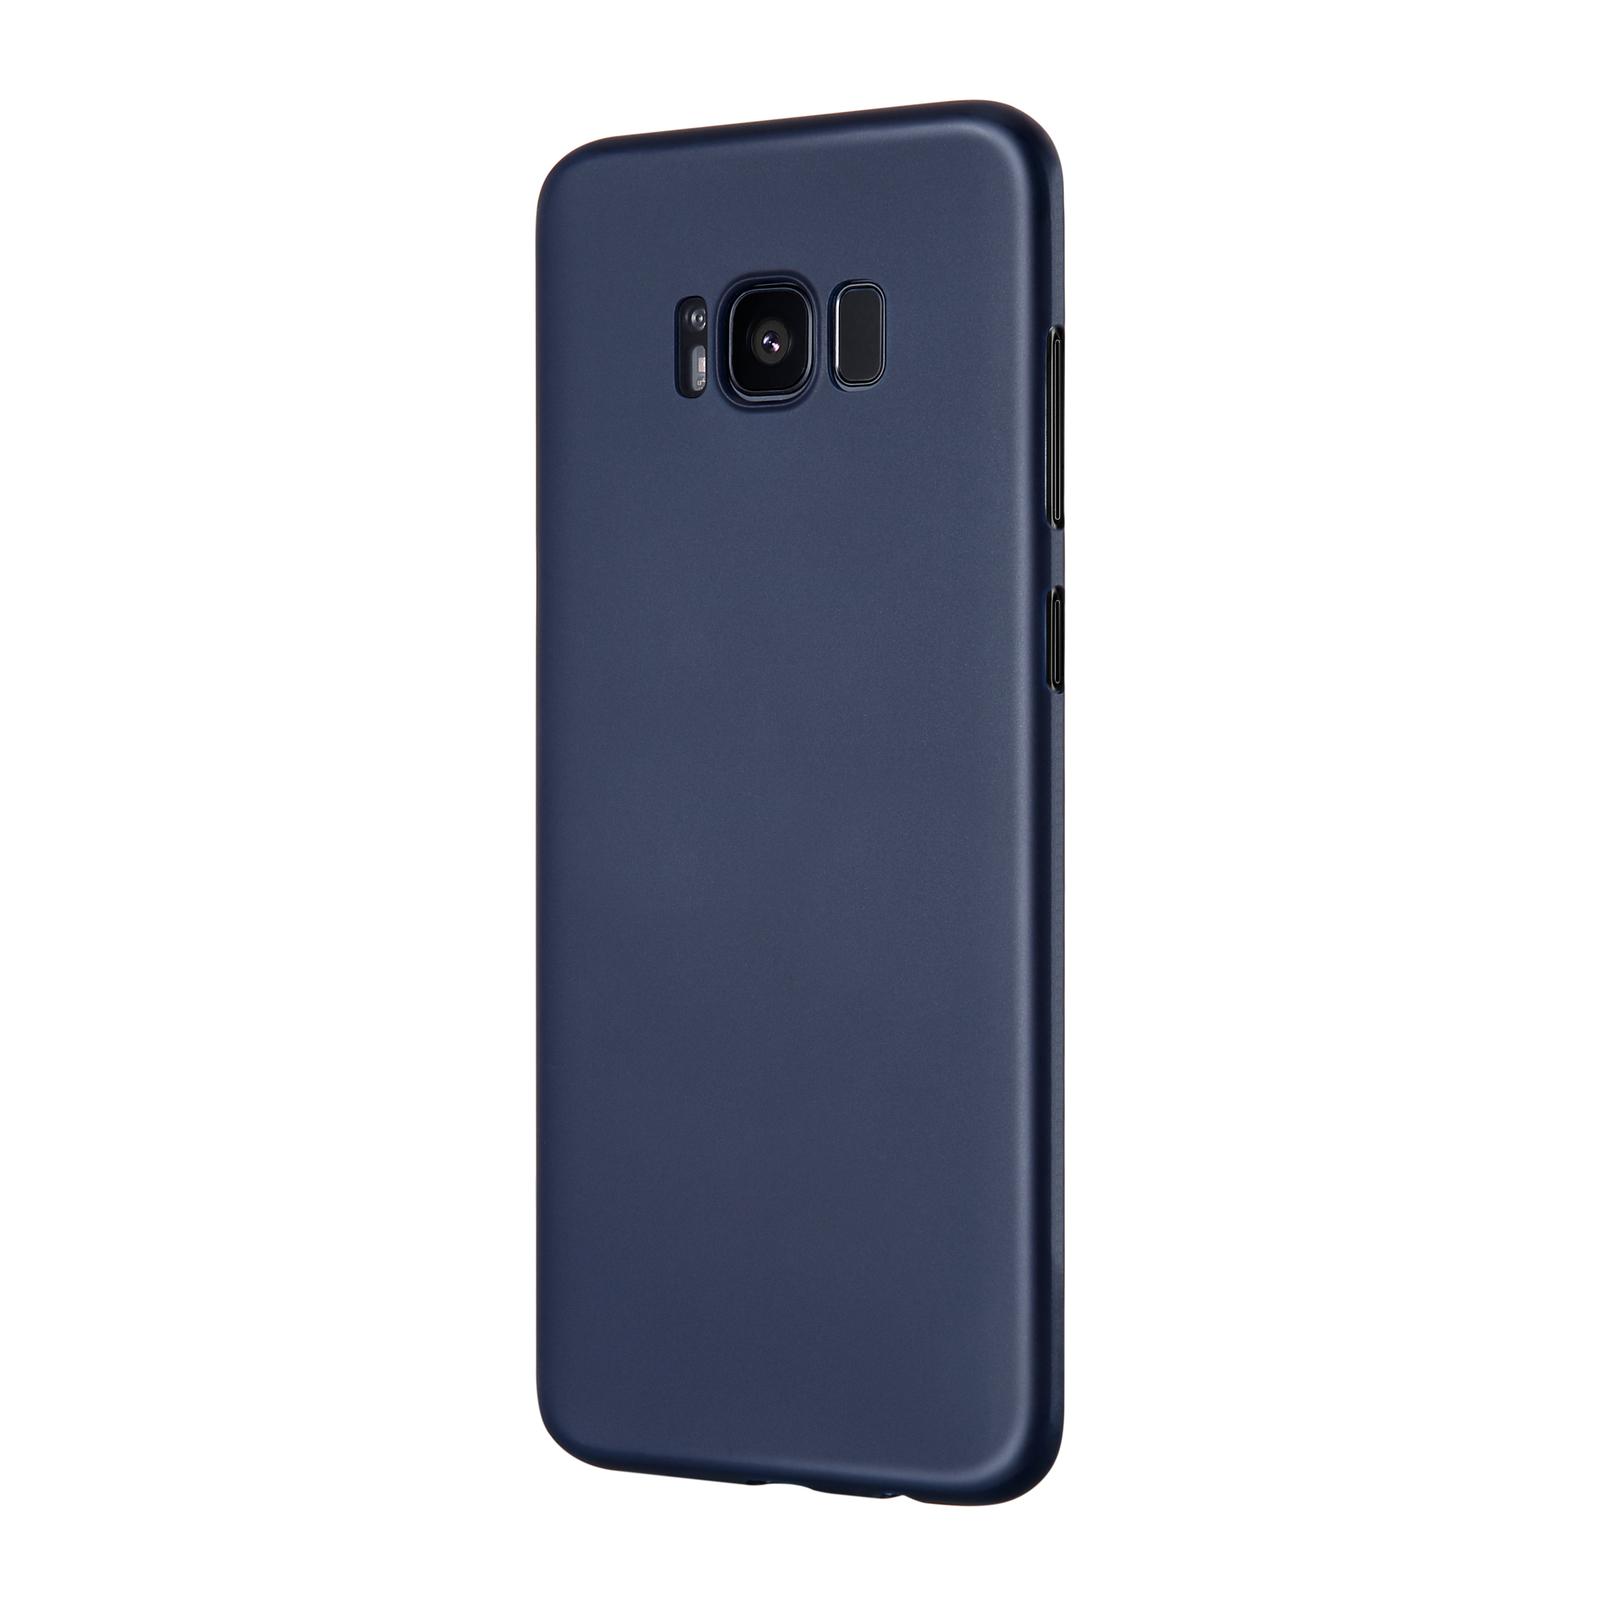 sale retailer 24968 7988e Kase: Go Original Samsung Galaxy S8 Plus Case - In The Navy